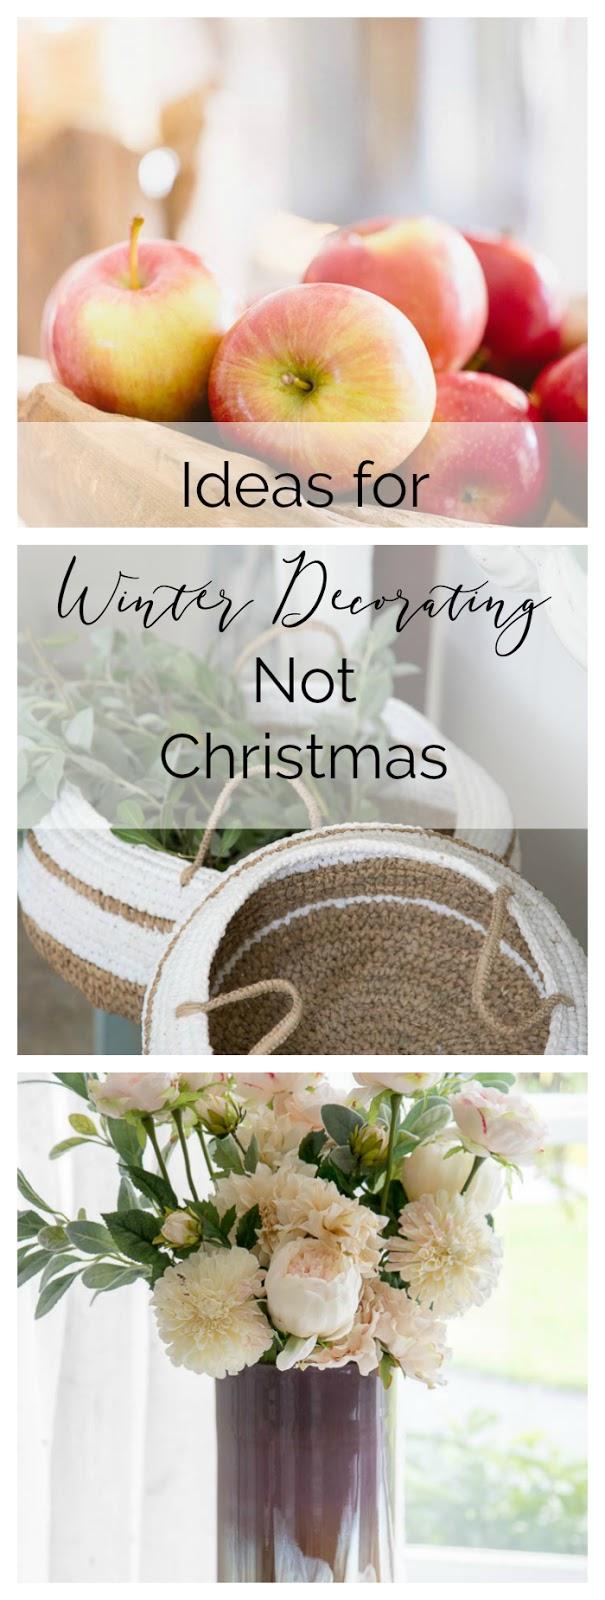 Winter Decorating Ideas - Home Inspiration